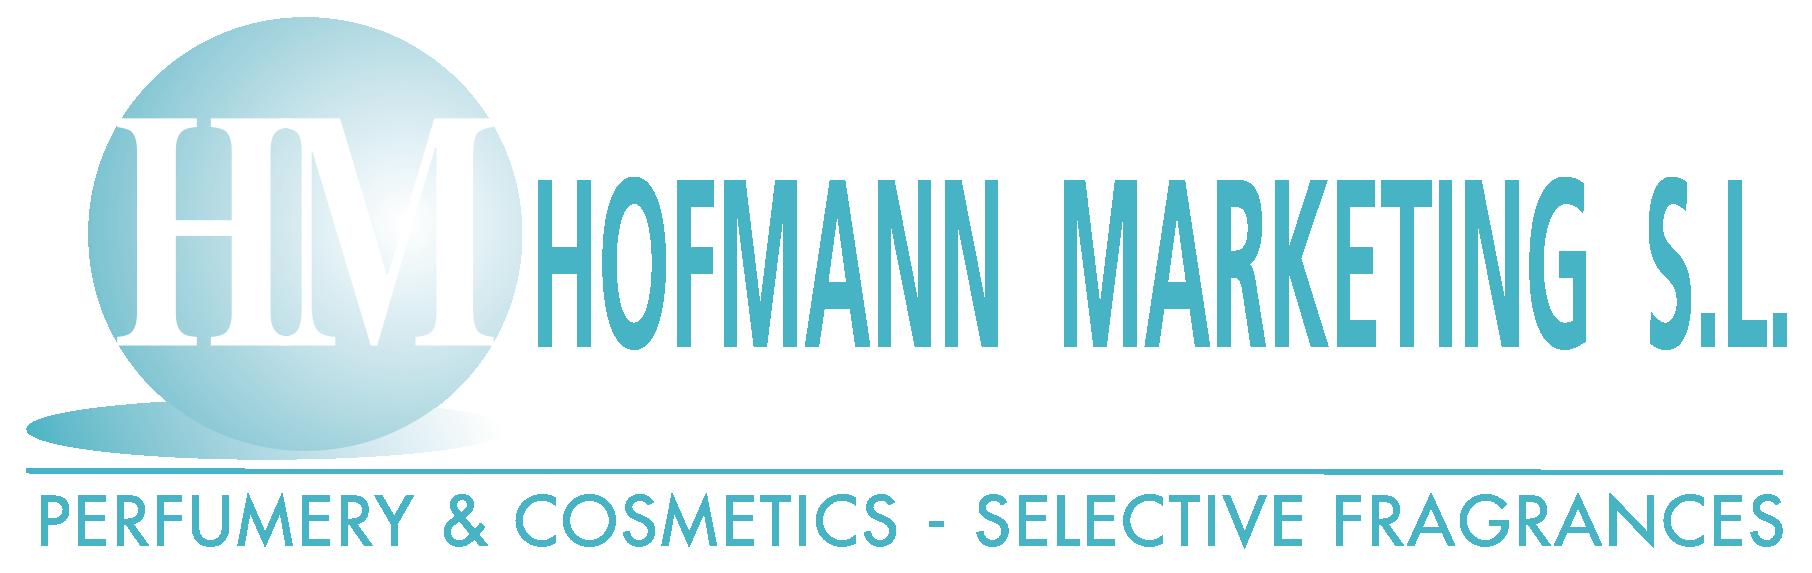 Hofmann Marketing